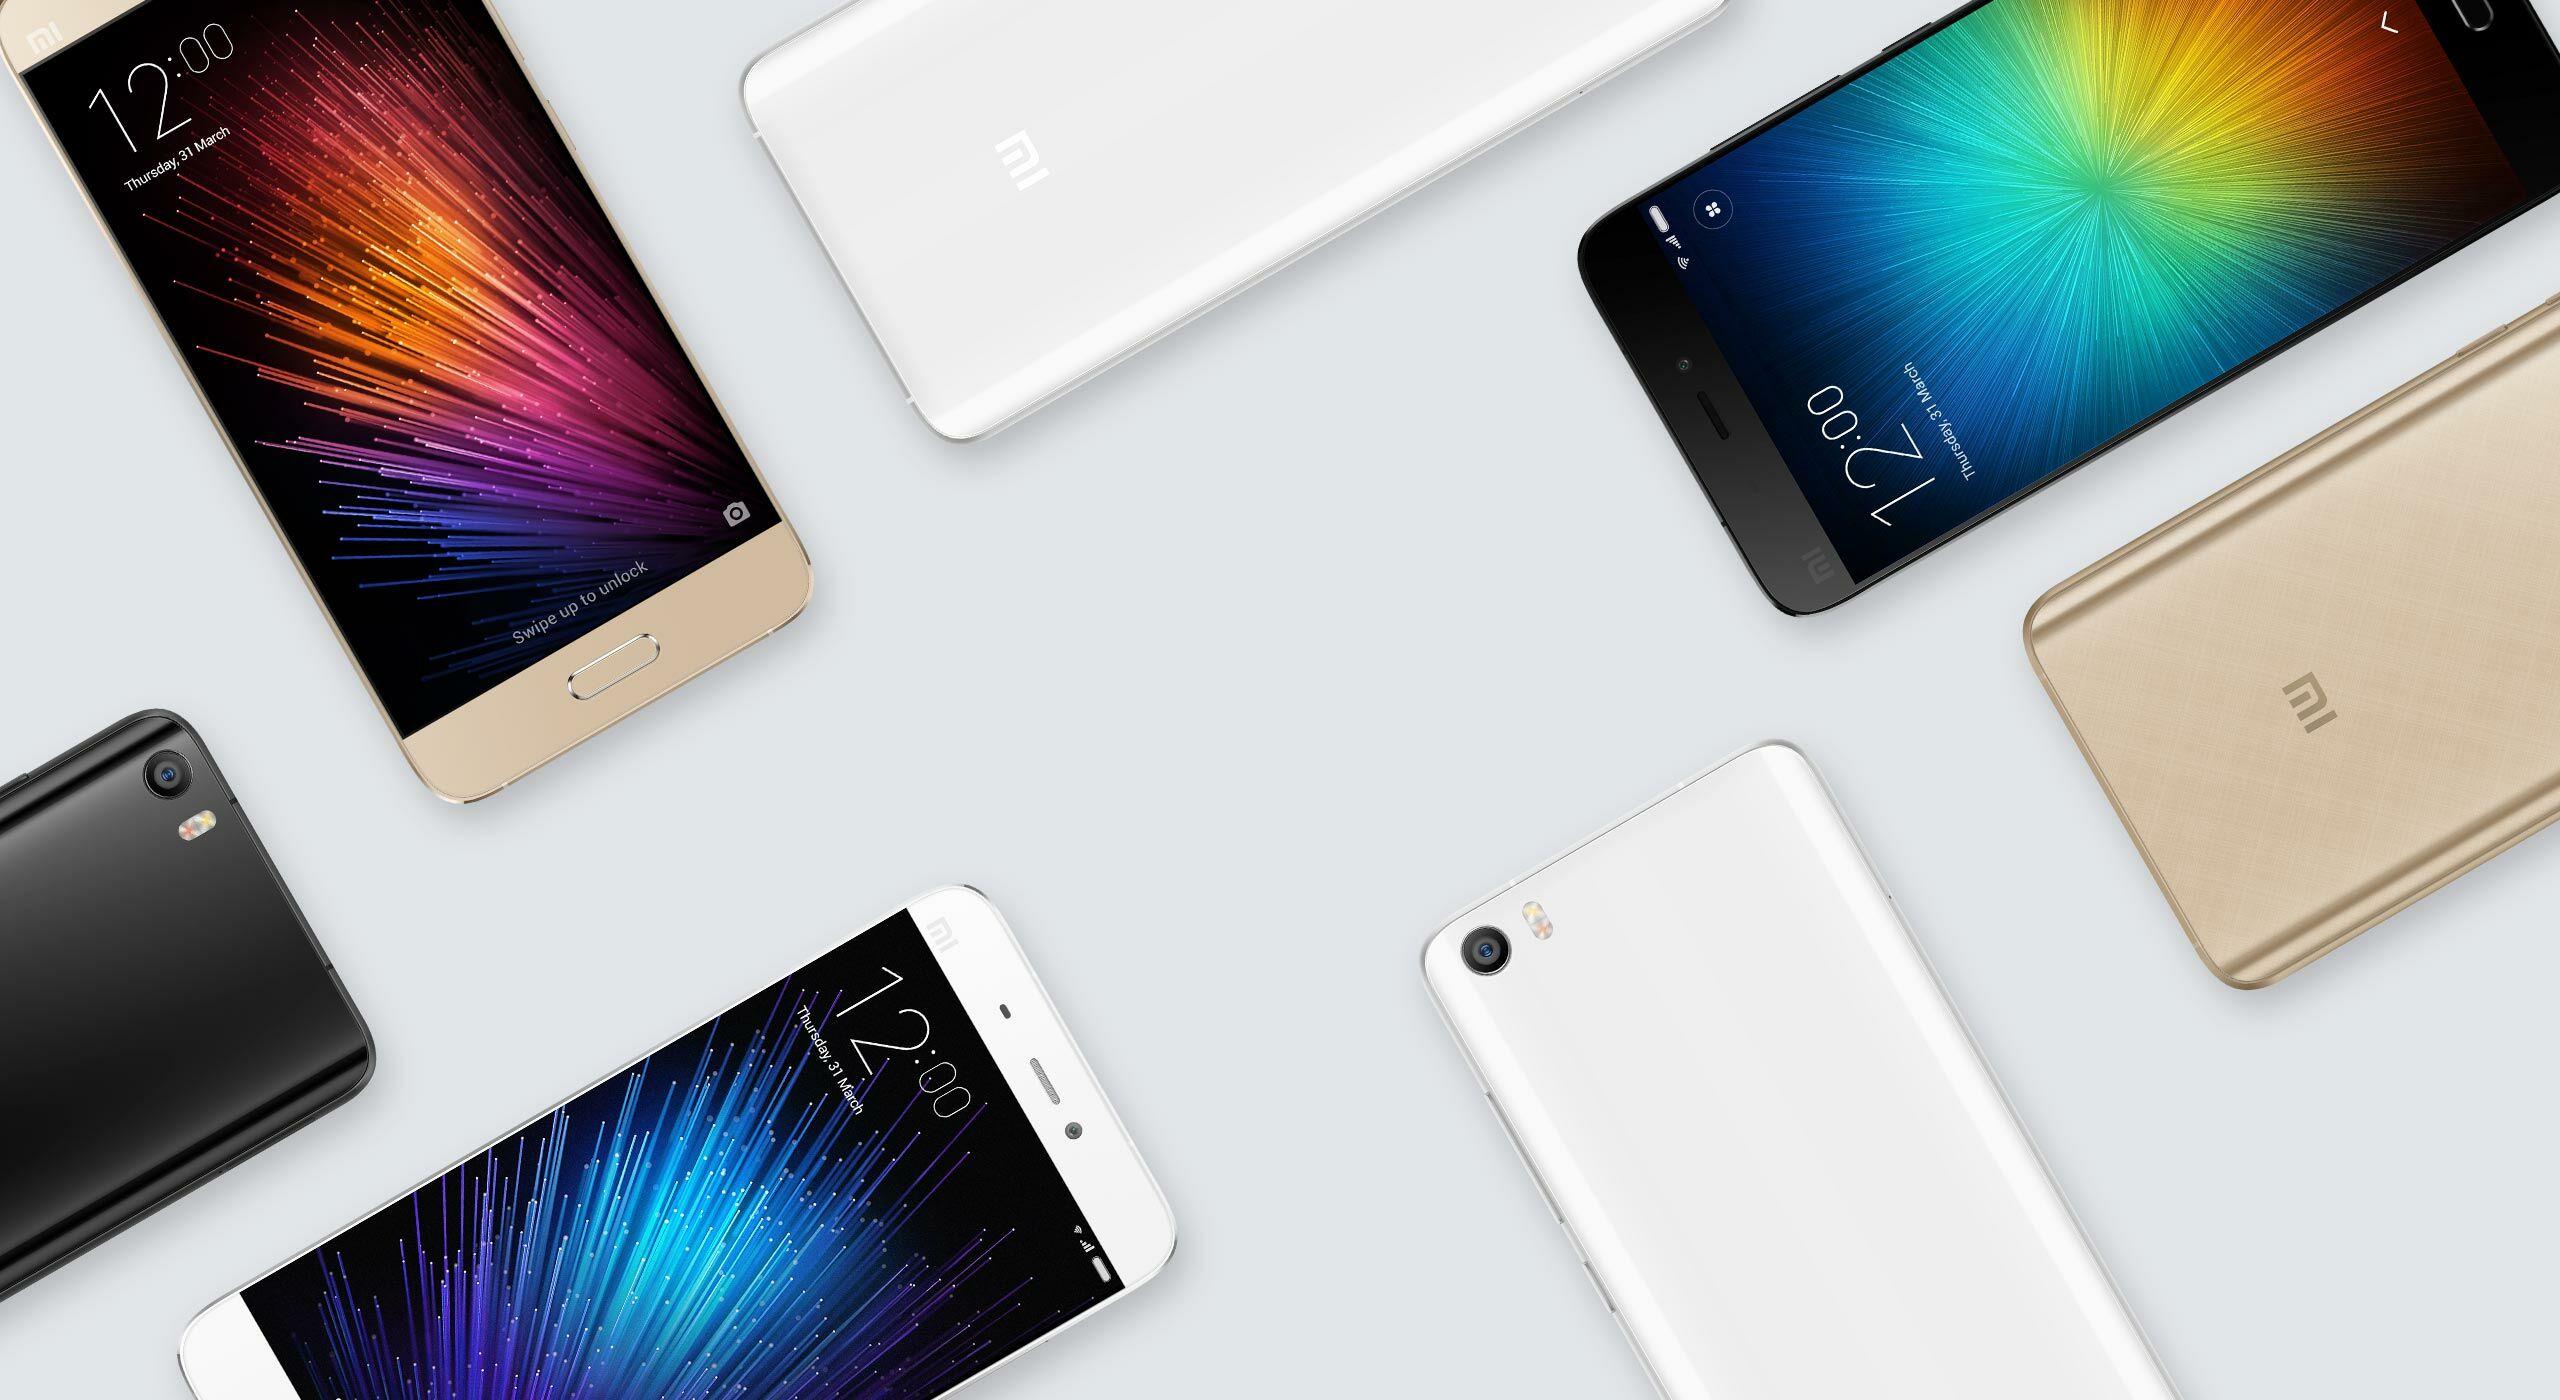 Xiaomi Mi 5 Standard Edition Rp 3 5 Jutaan